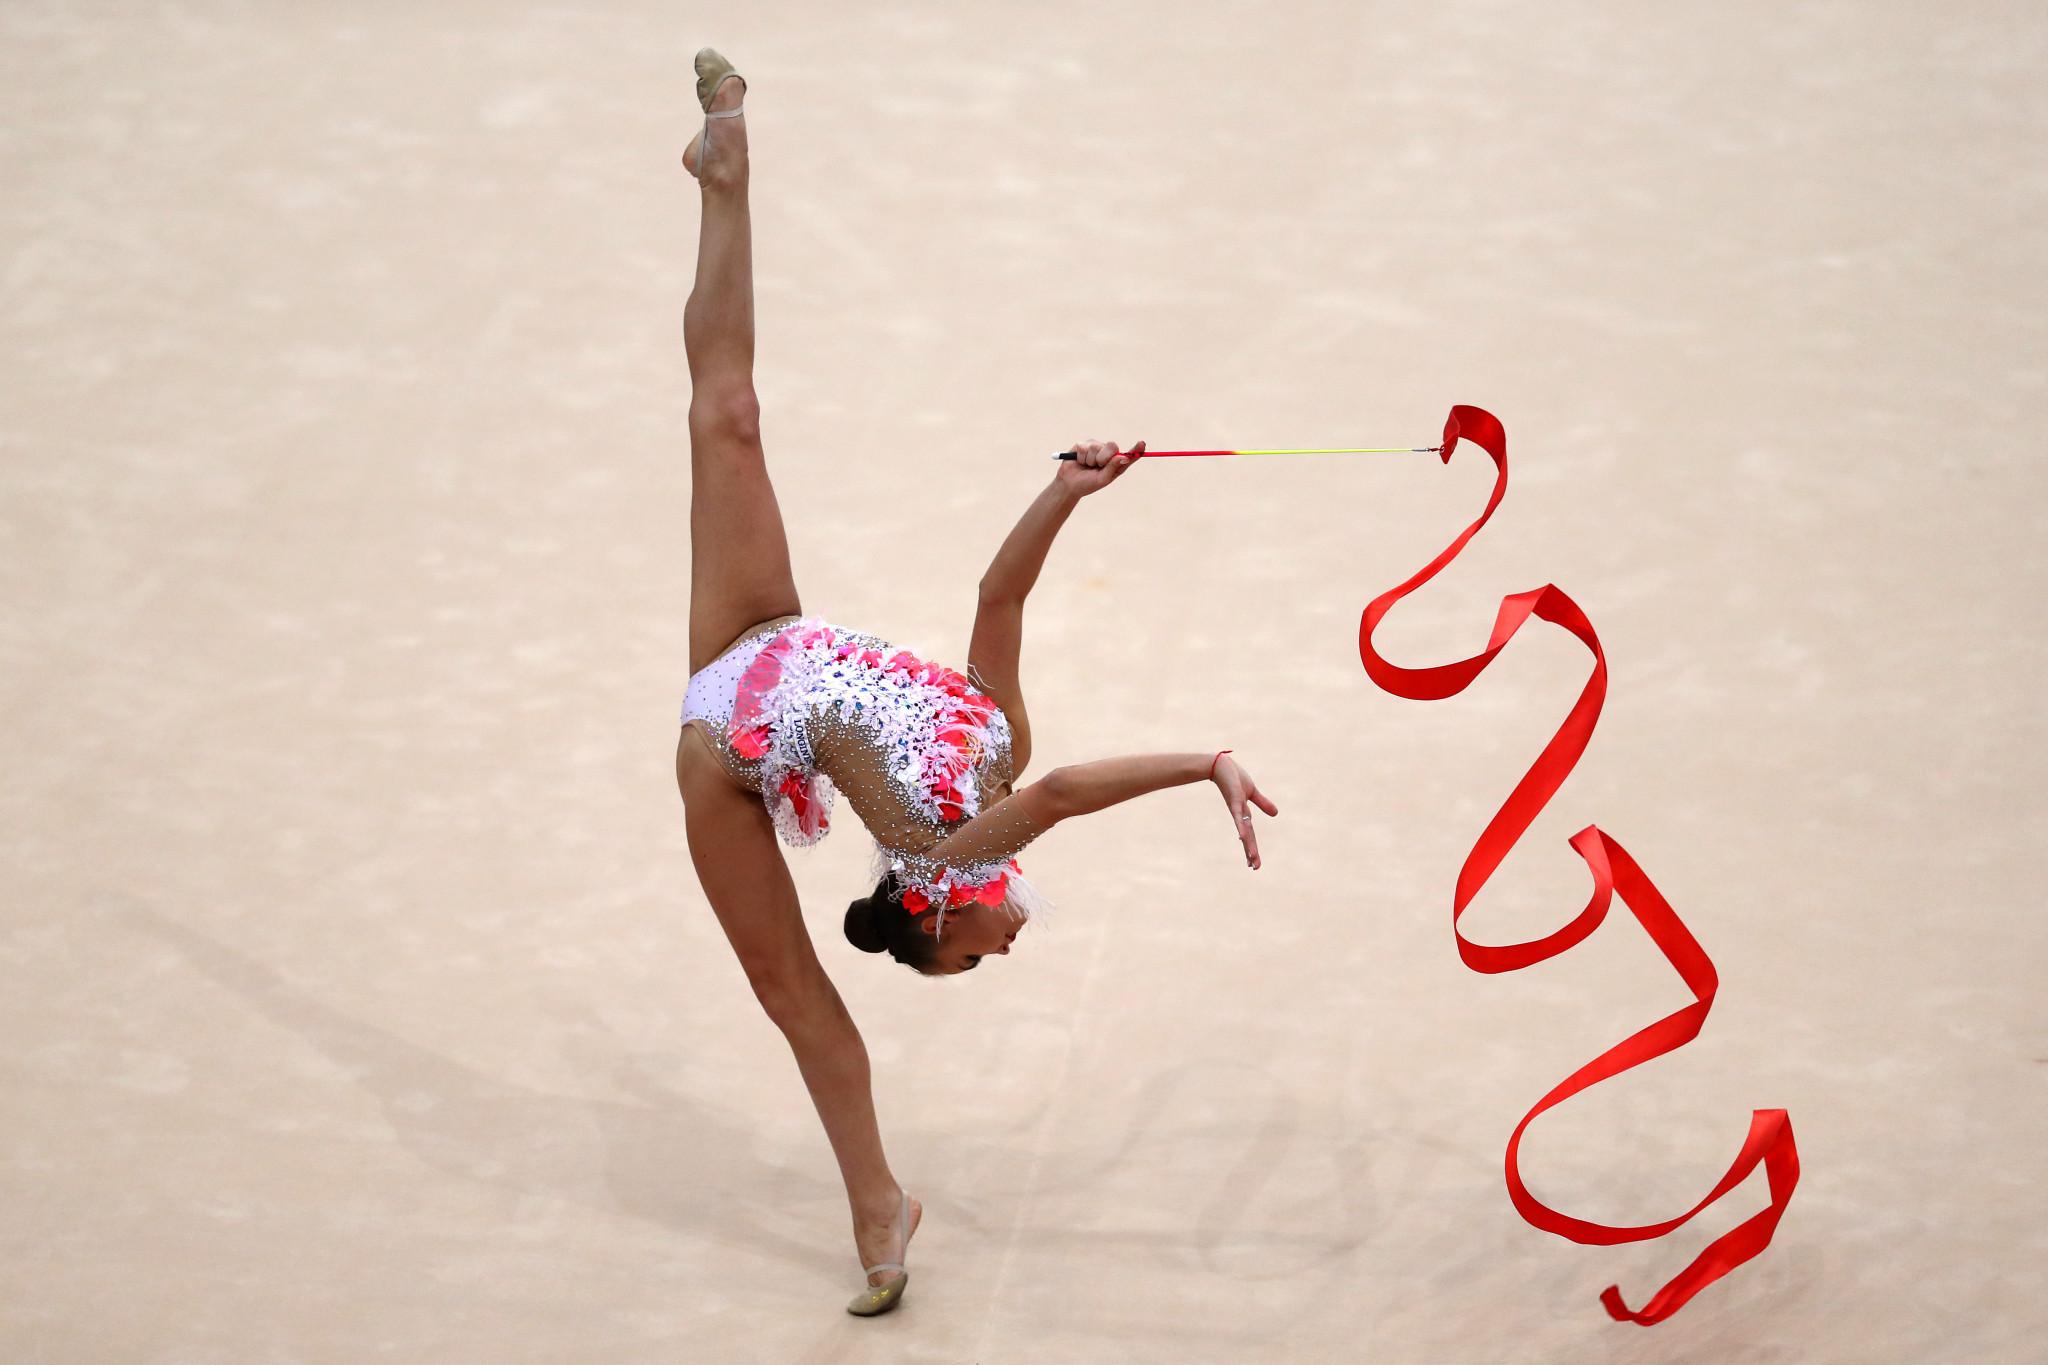 Tokyo 2020 places on offer at FIG Rhythmic Gymnastics World Championships in Baku